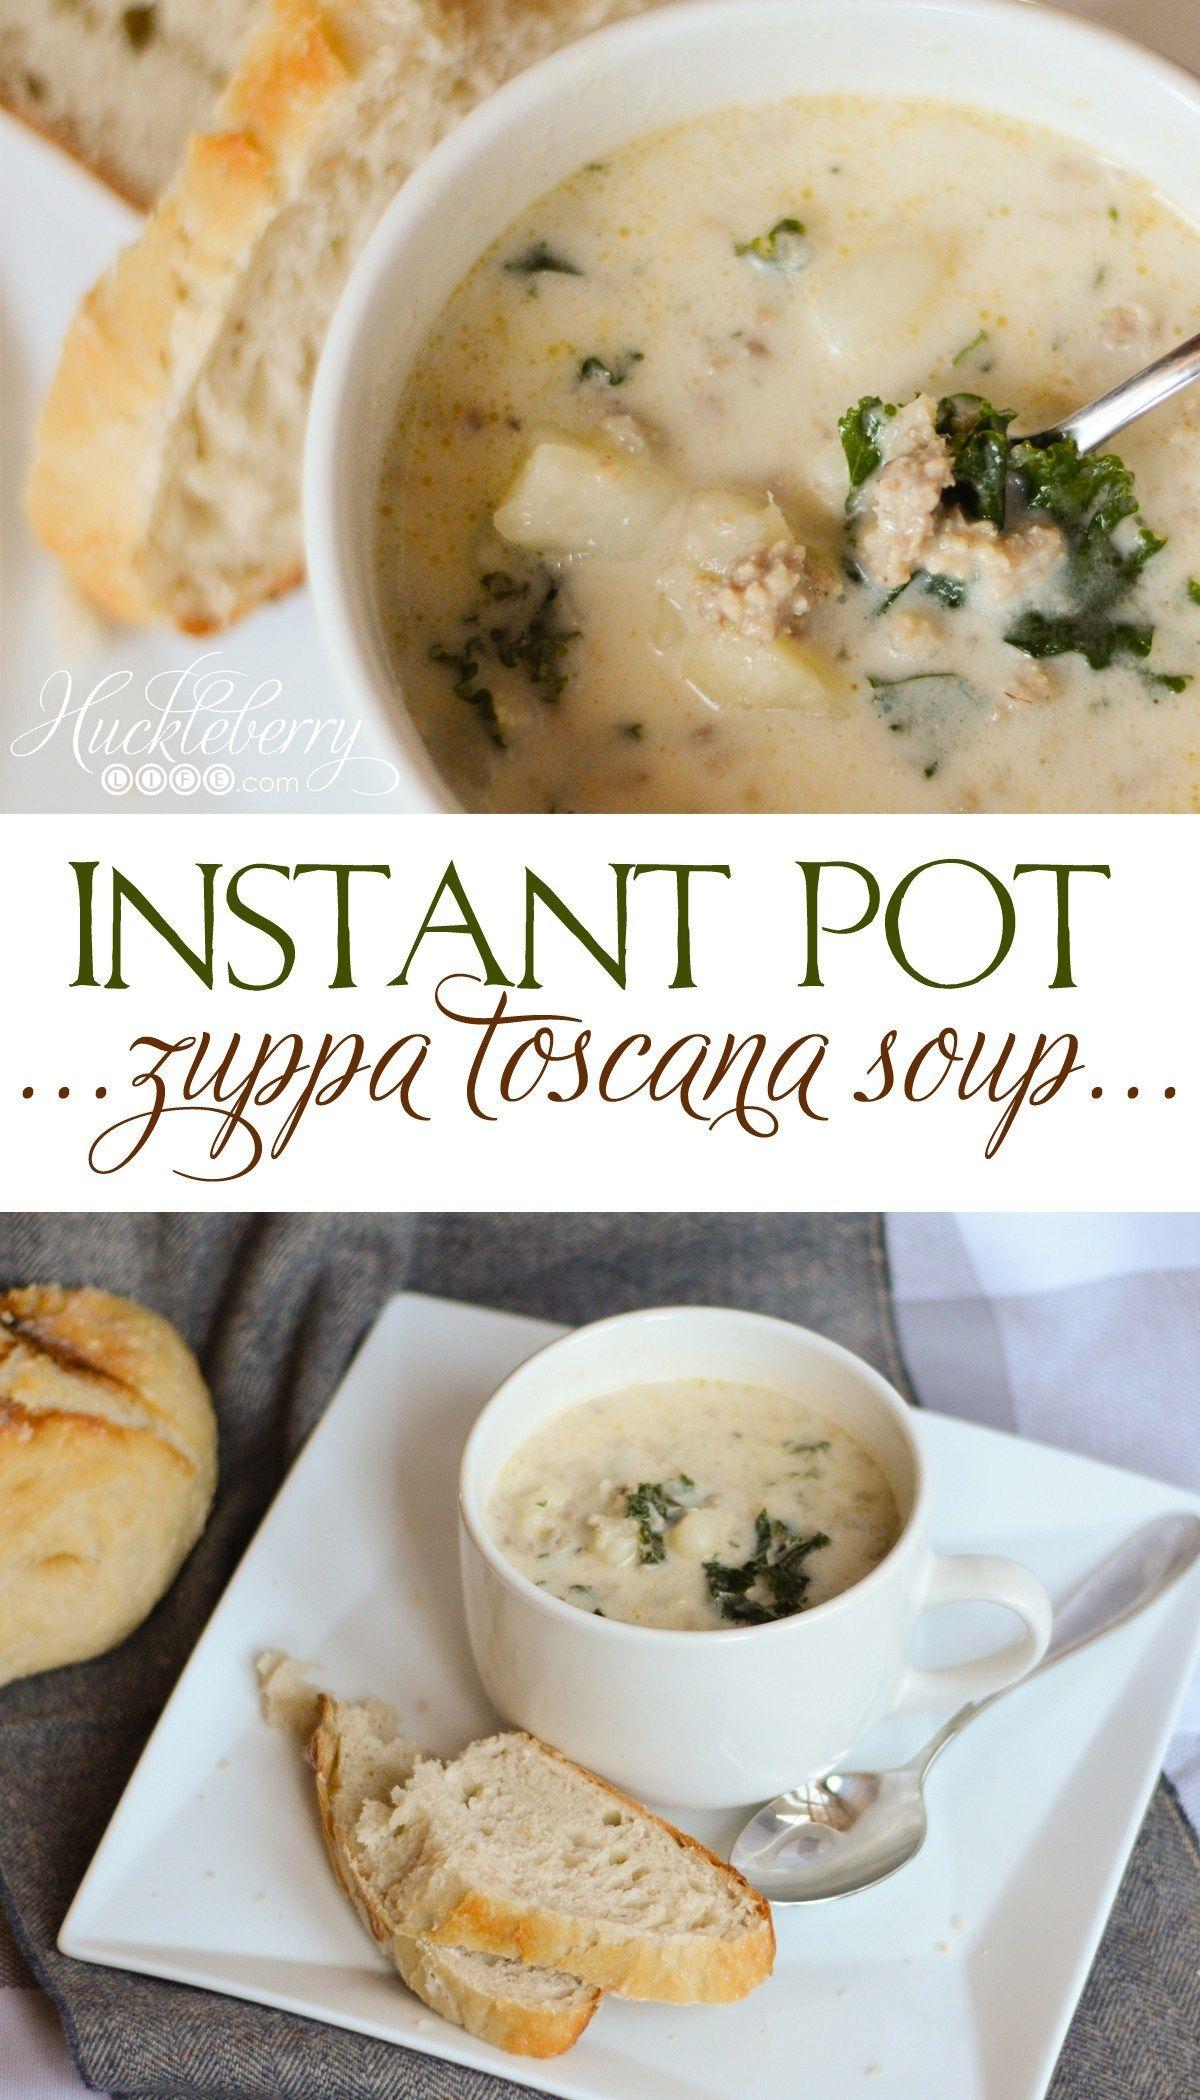 Instant pot zuppa toscana soup Recipe Toscana soup